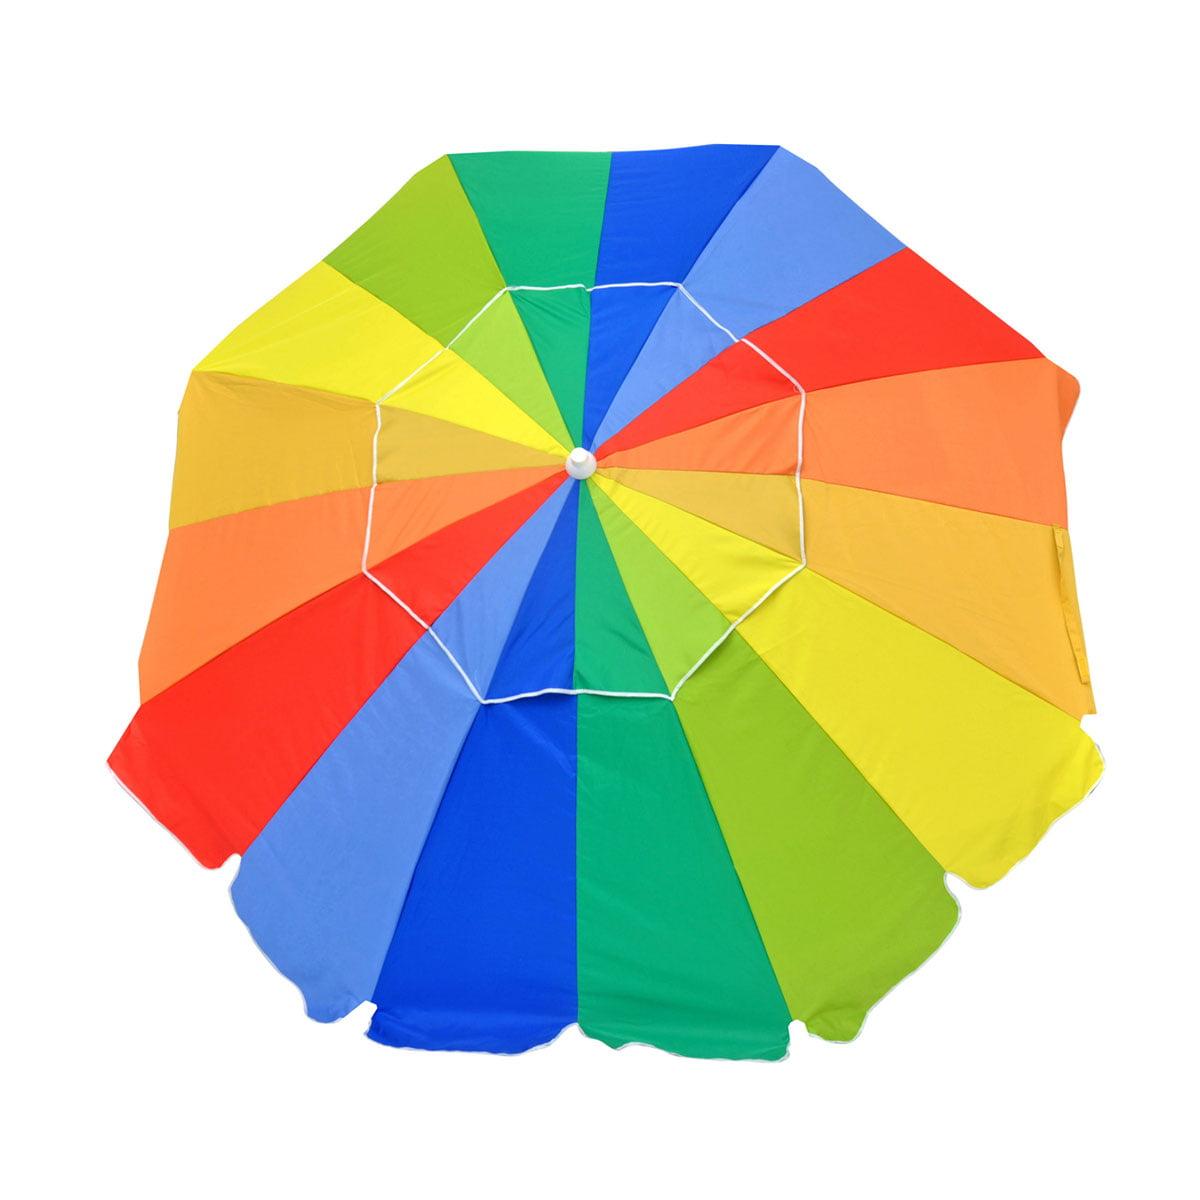 7.5 ft Commercial Grade Fiberglass Beach / Patio Umbrella UPF100 with Accessory Hook - One Yr Warranty